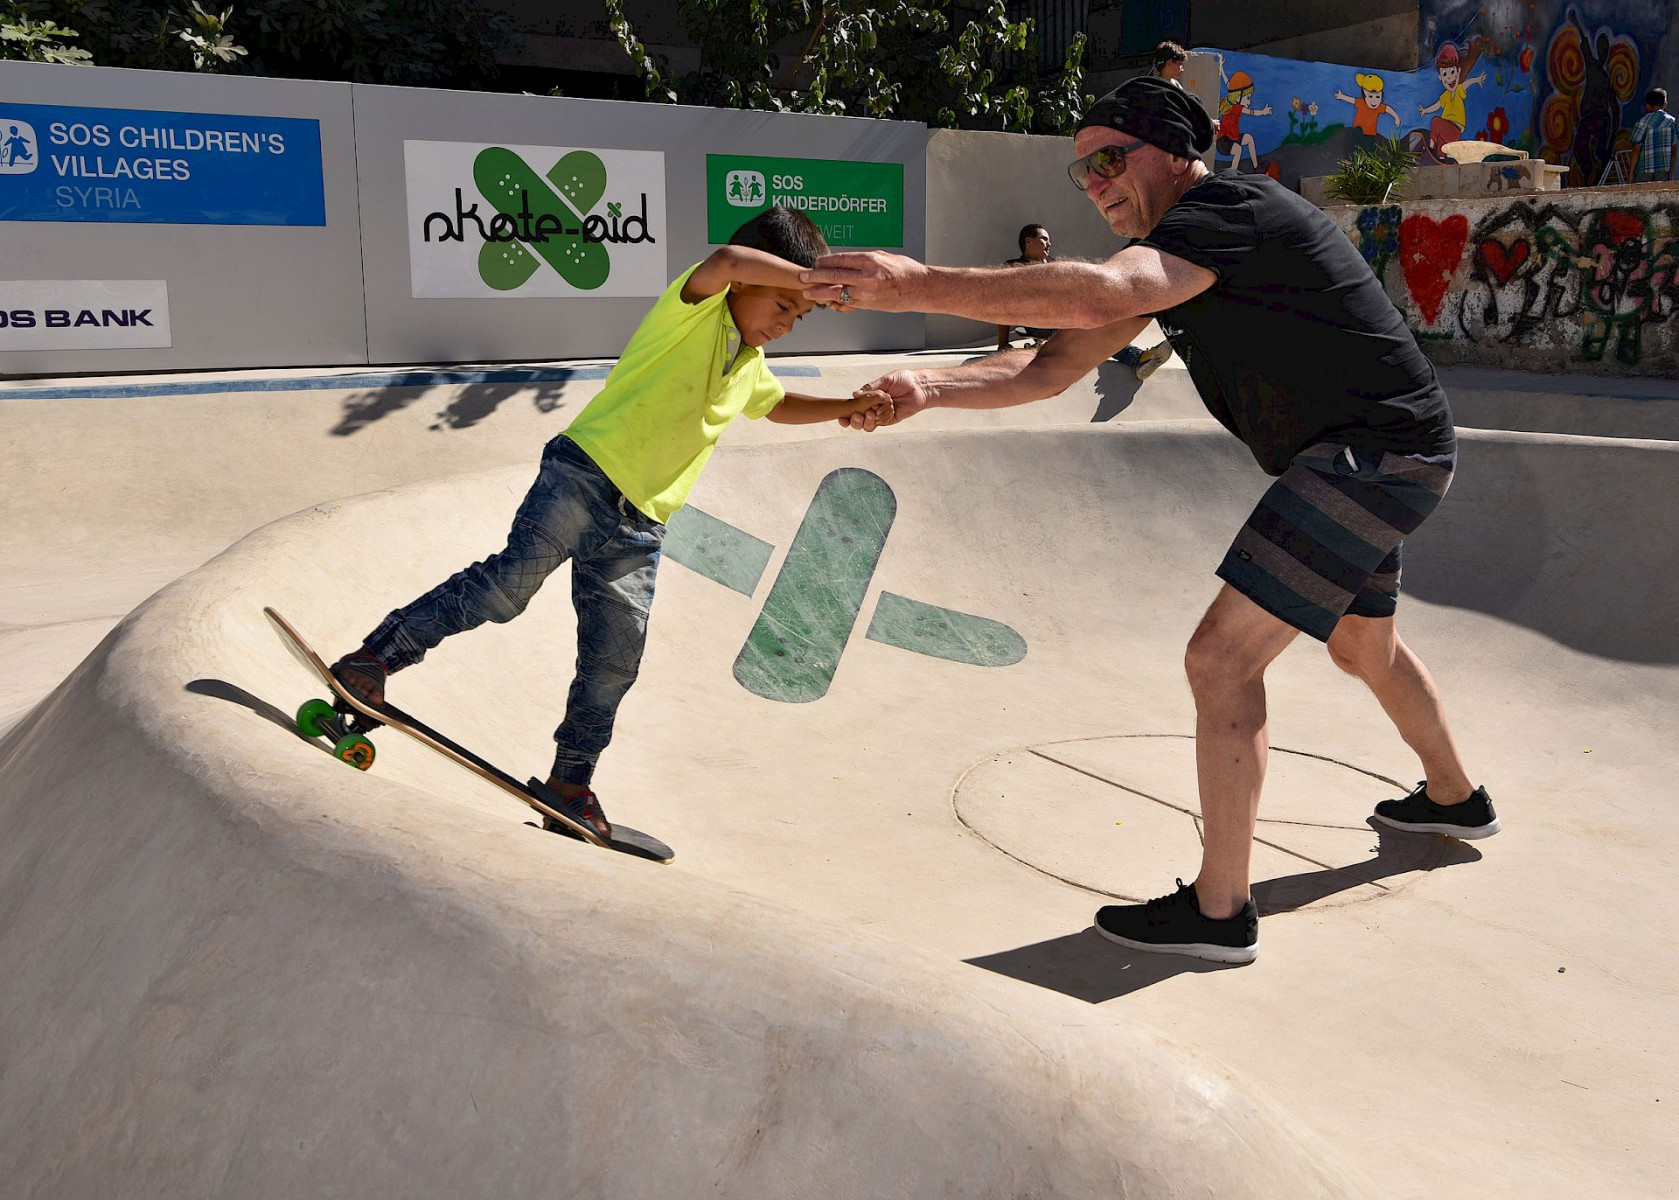 skatepark_damaskus_skate-aid_m_giersch_6.1920x0